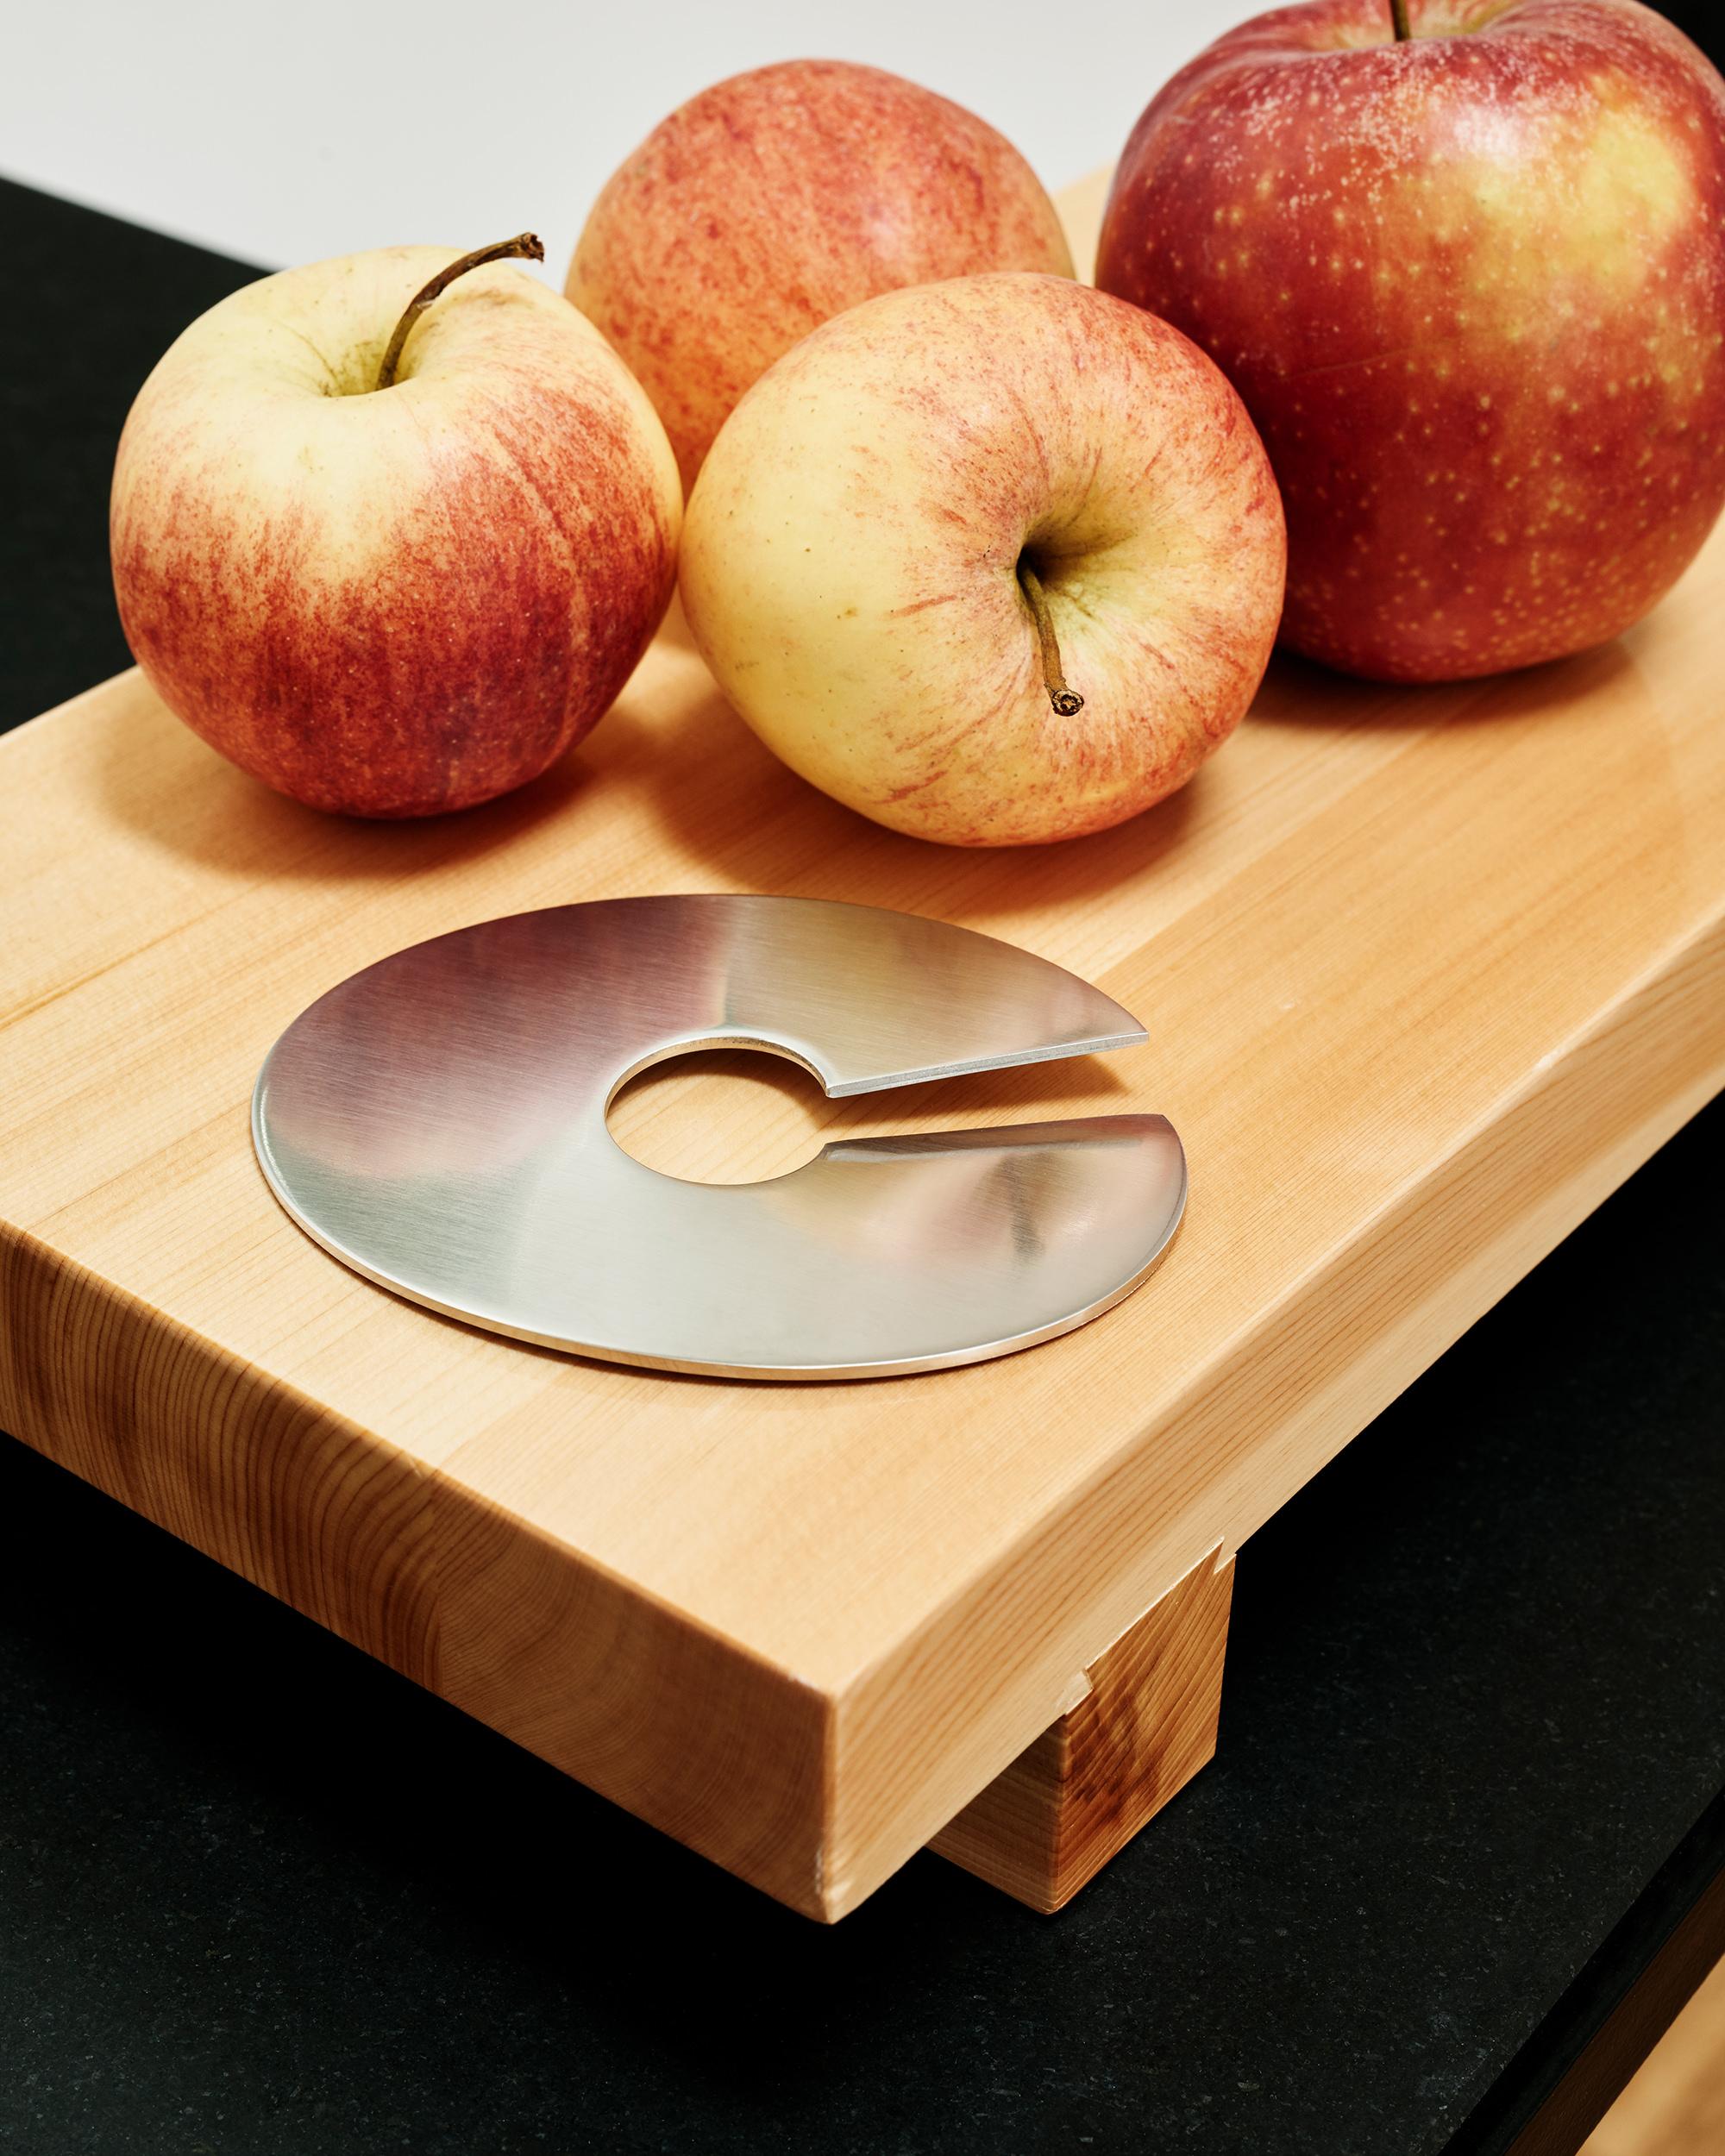 Mono Giro Apfelschneider Apple slicer Credits Fabian Frinzel